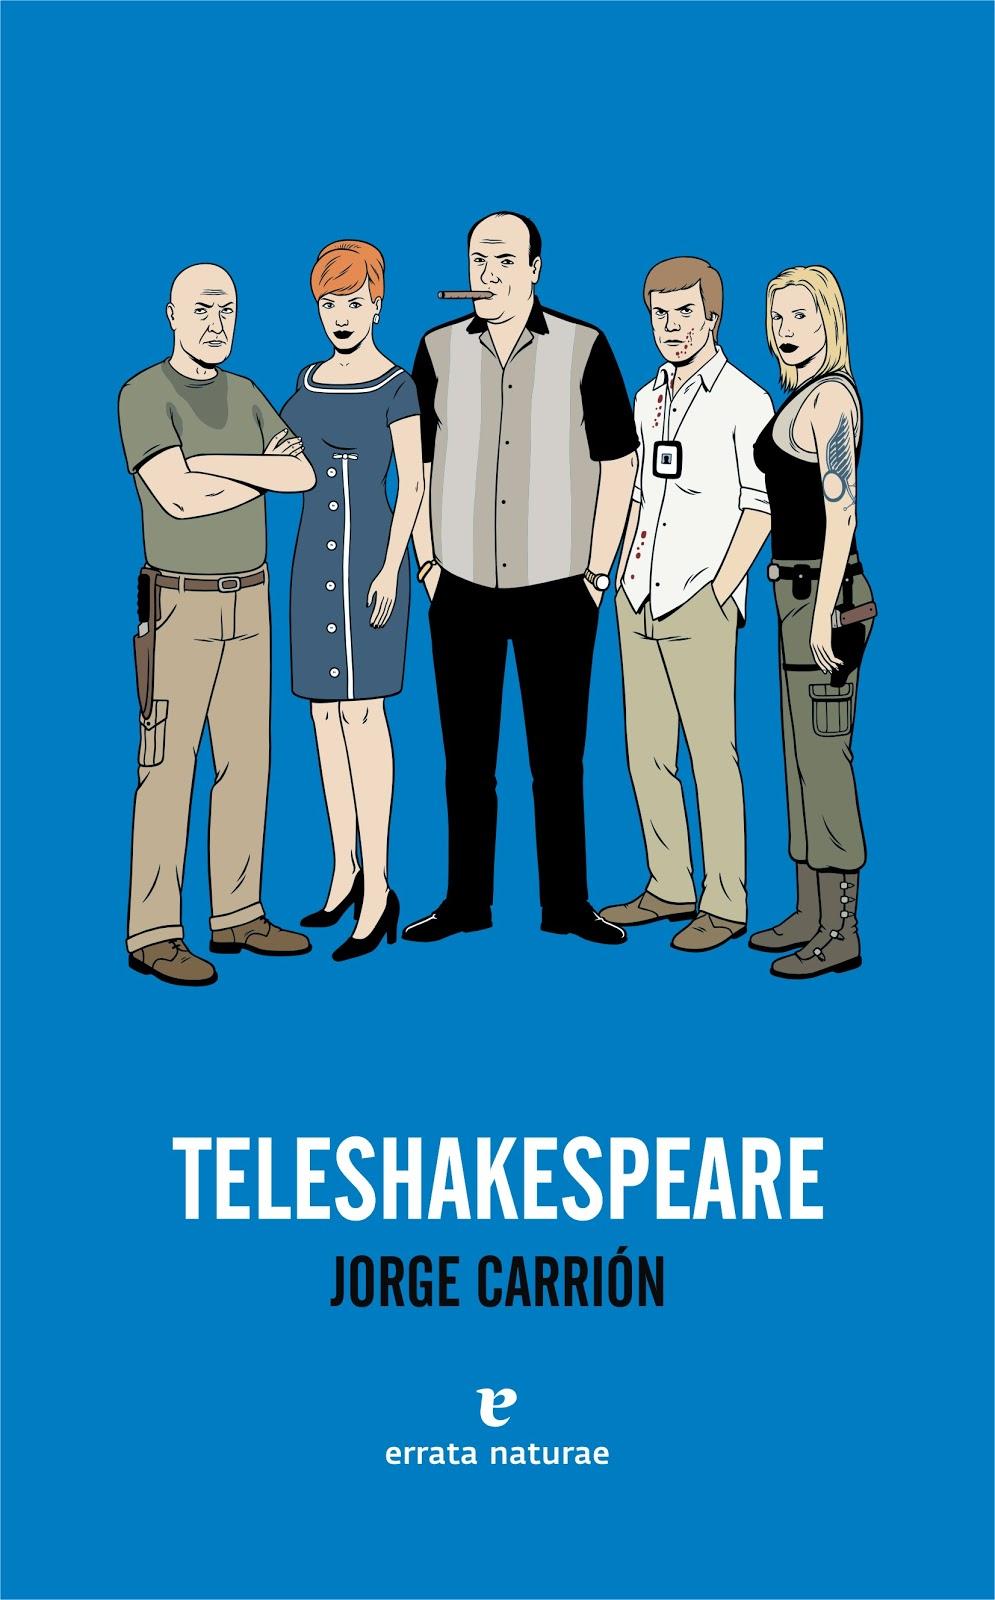 Literatura de Serie B  Teleshakespeare